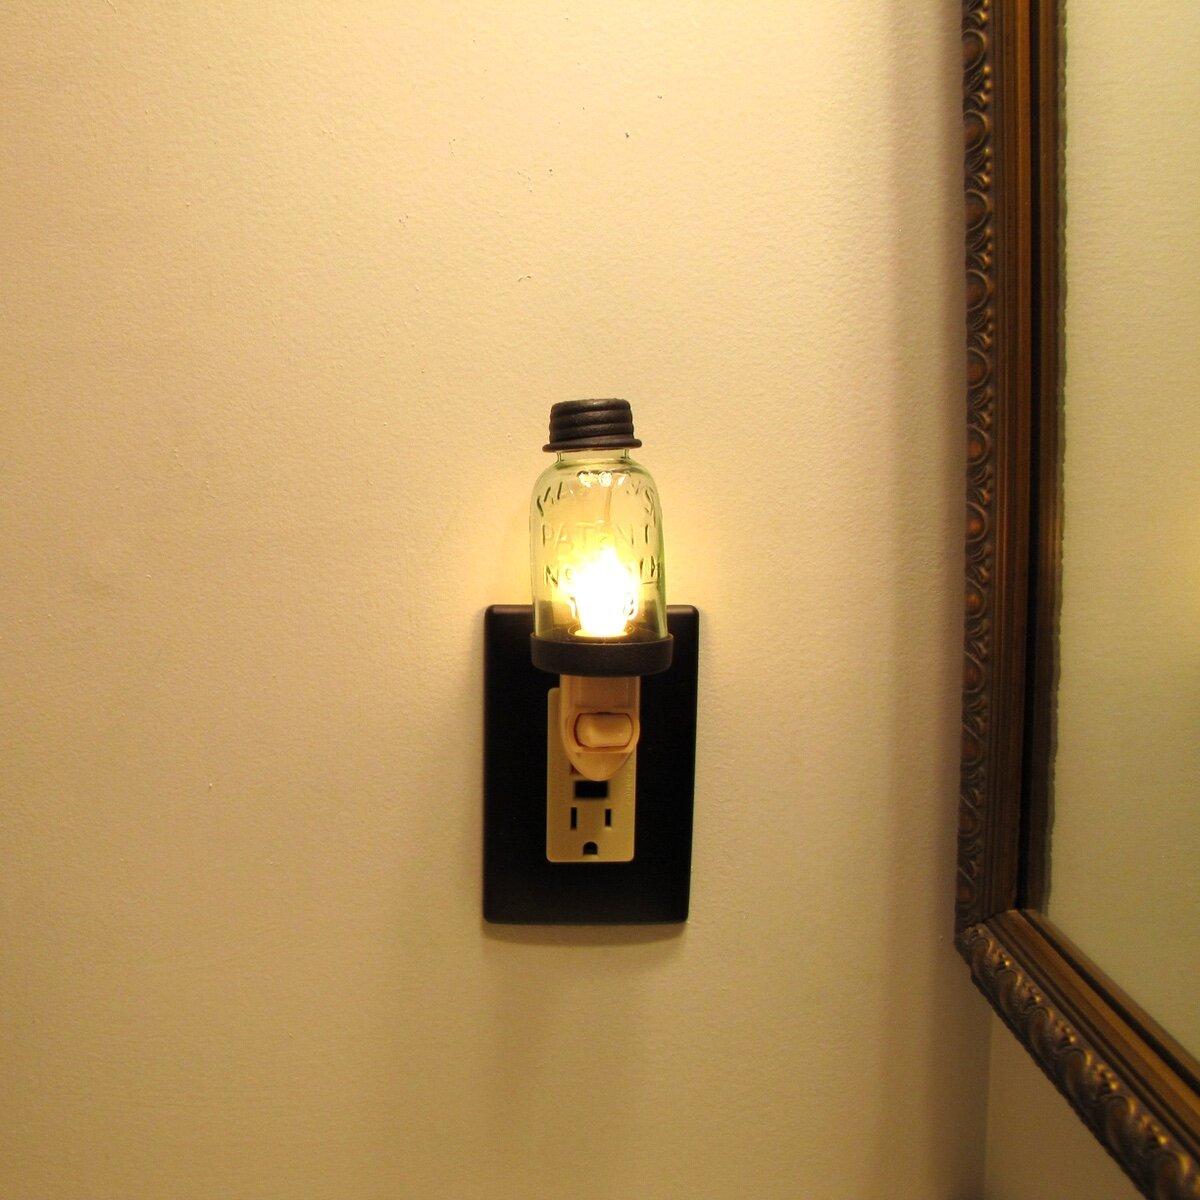 Plug In Wall Lamp Bulb Night Light